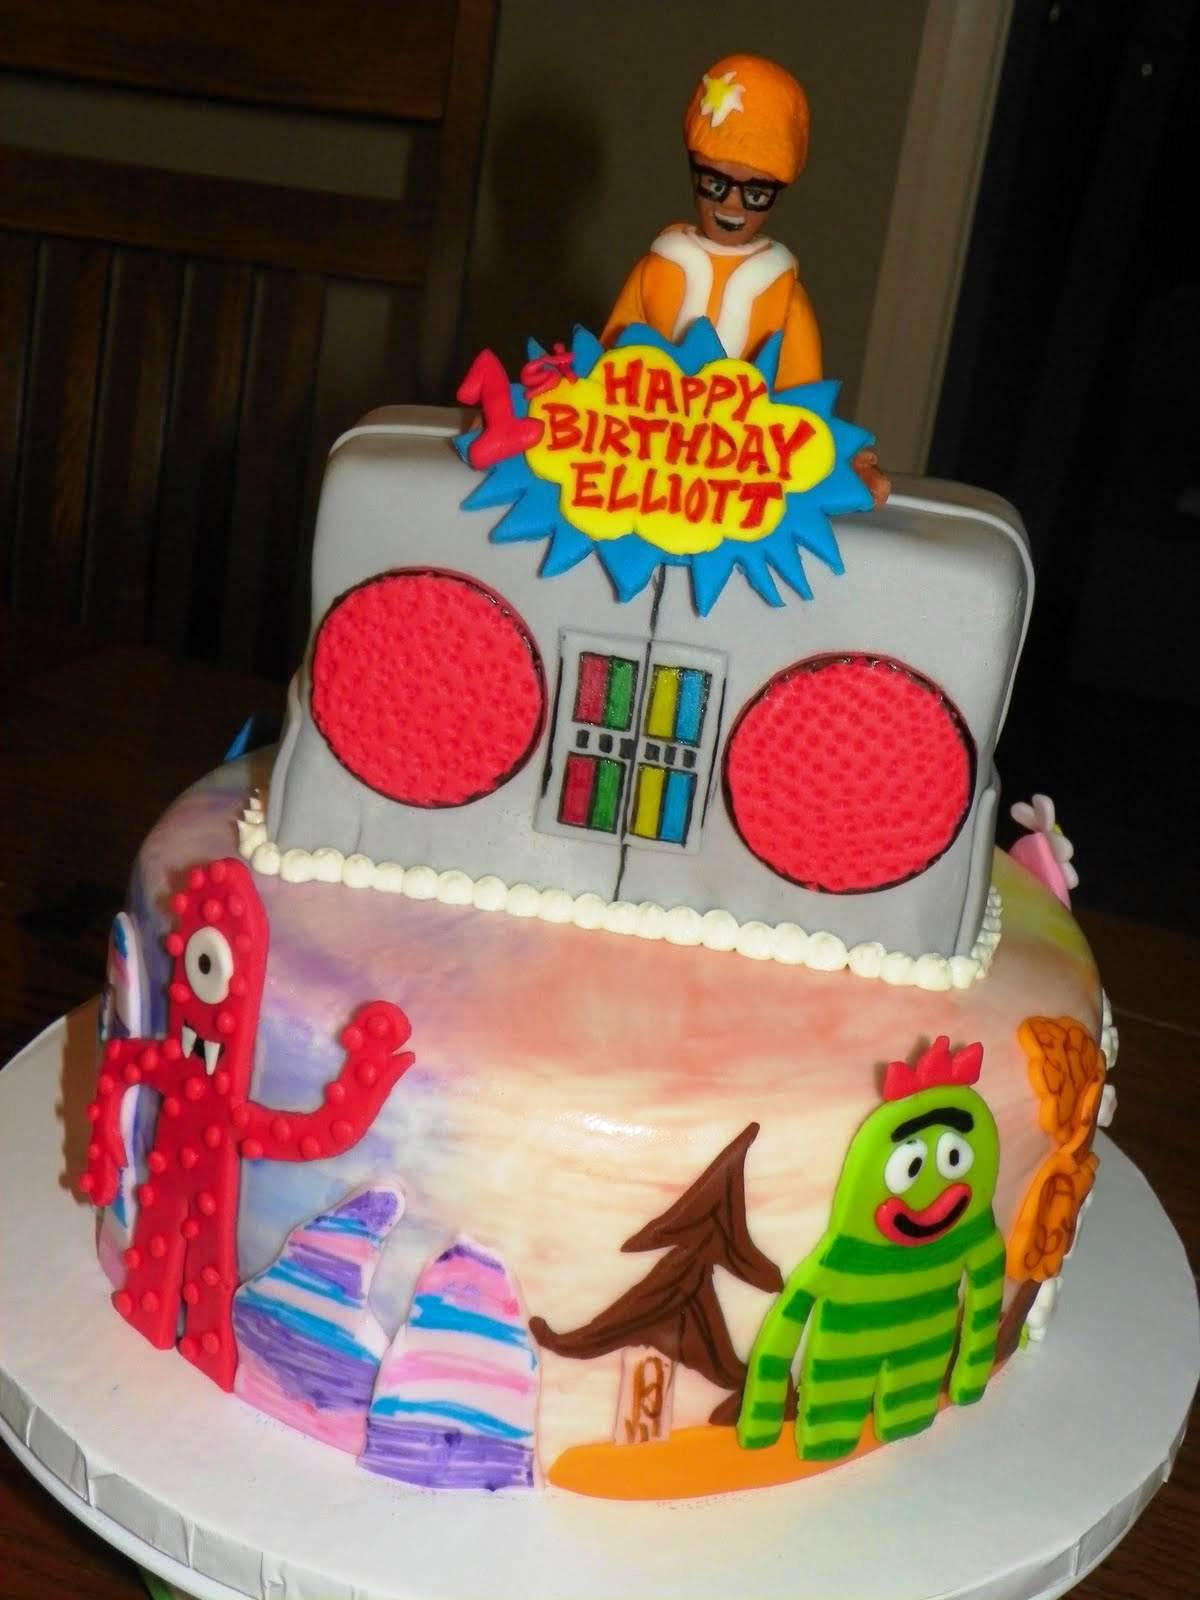 10 Gorgeous Yo Gabba Gabba Cakes Ideas yo gabba gabba birthday cakes find the supplies ideas urban dog 2020